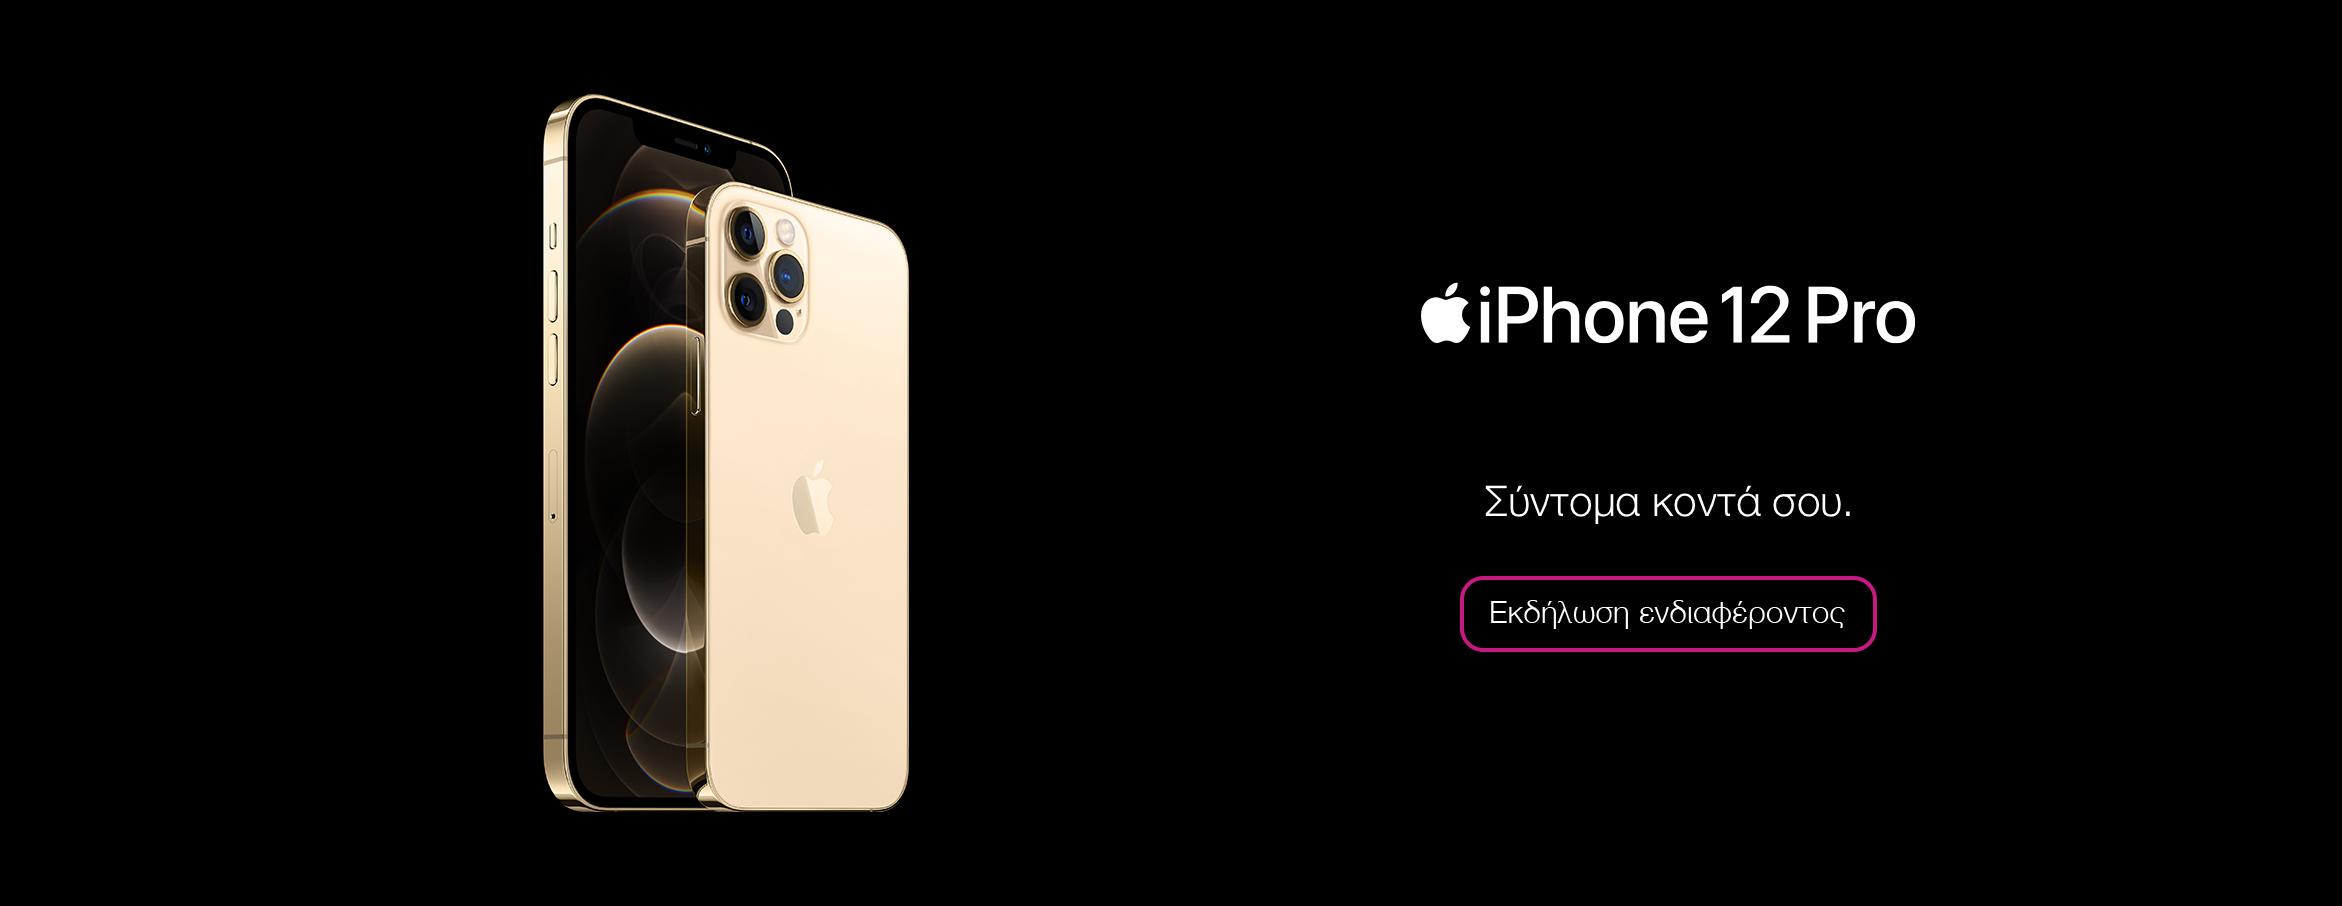 iPhone_12pro_banner_interest2